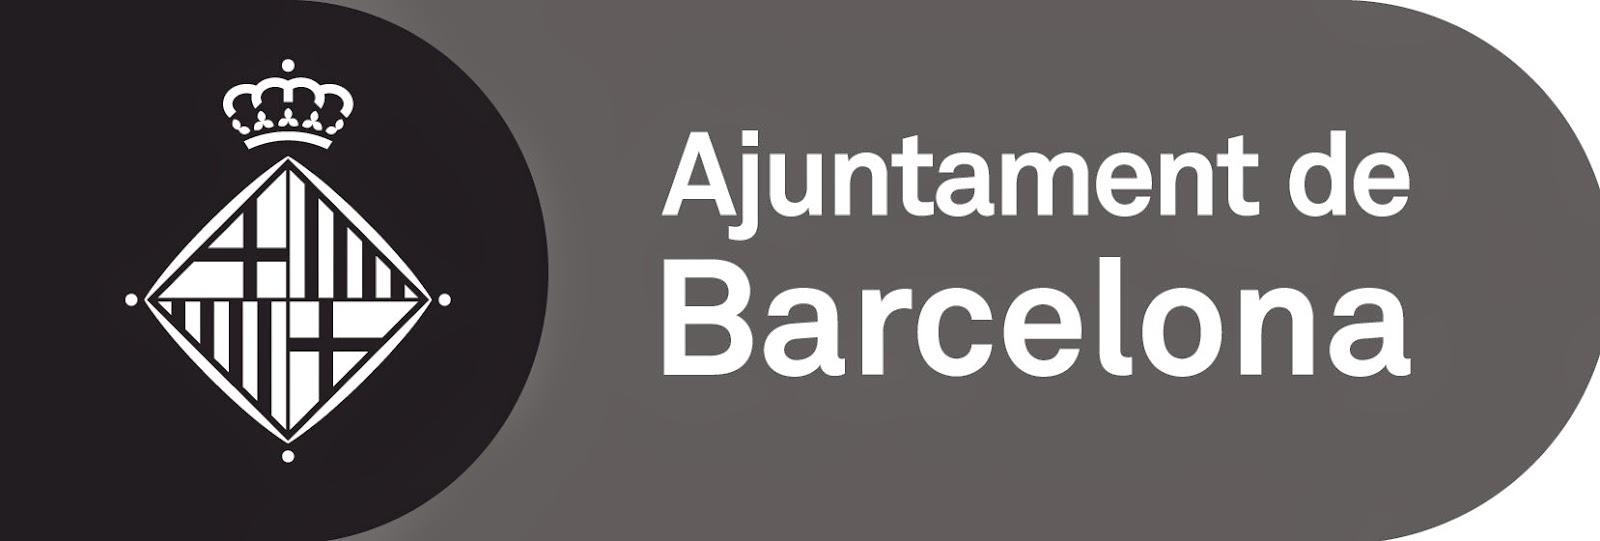 http://www.bcn.cat/es/